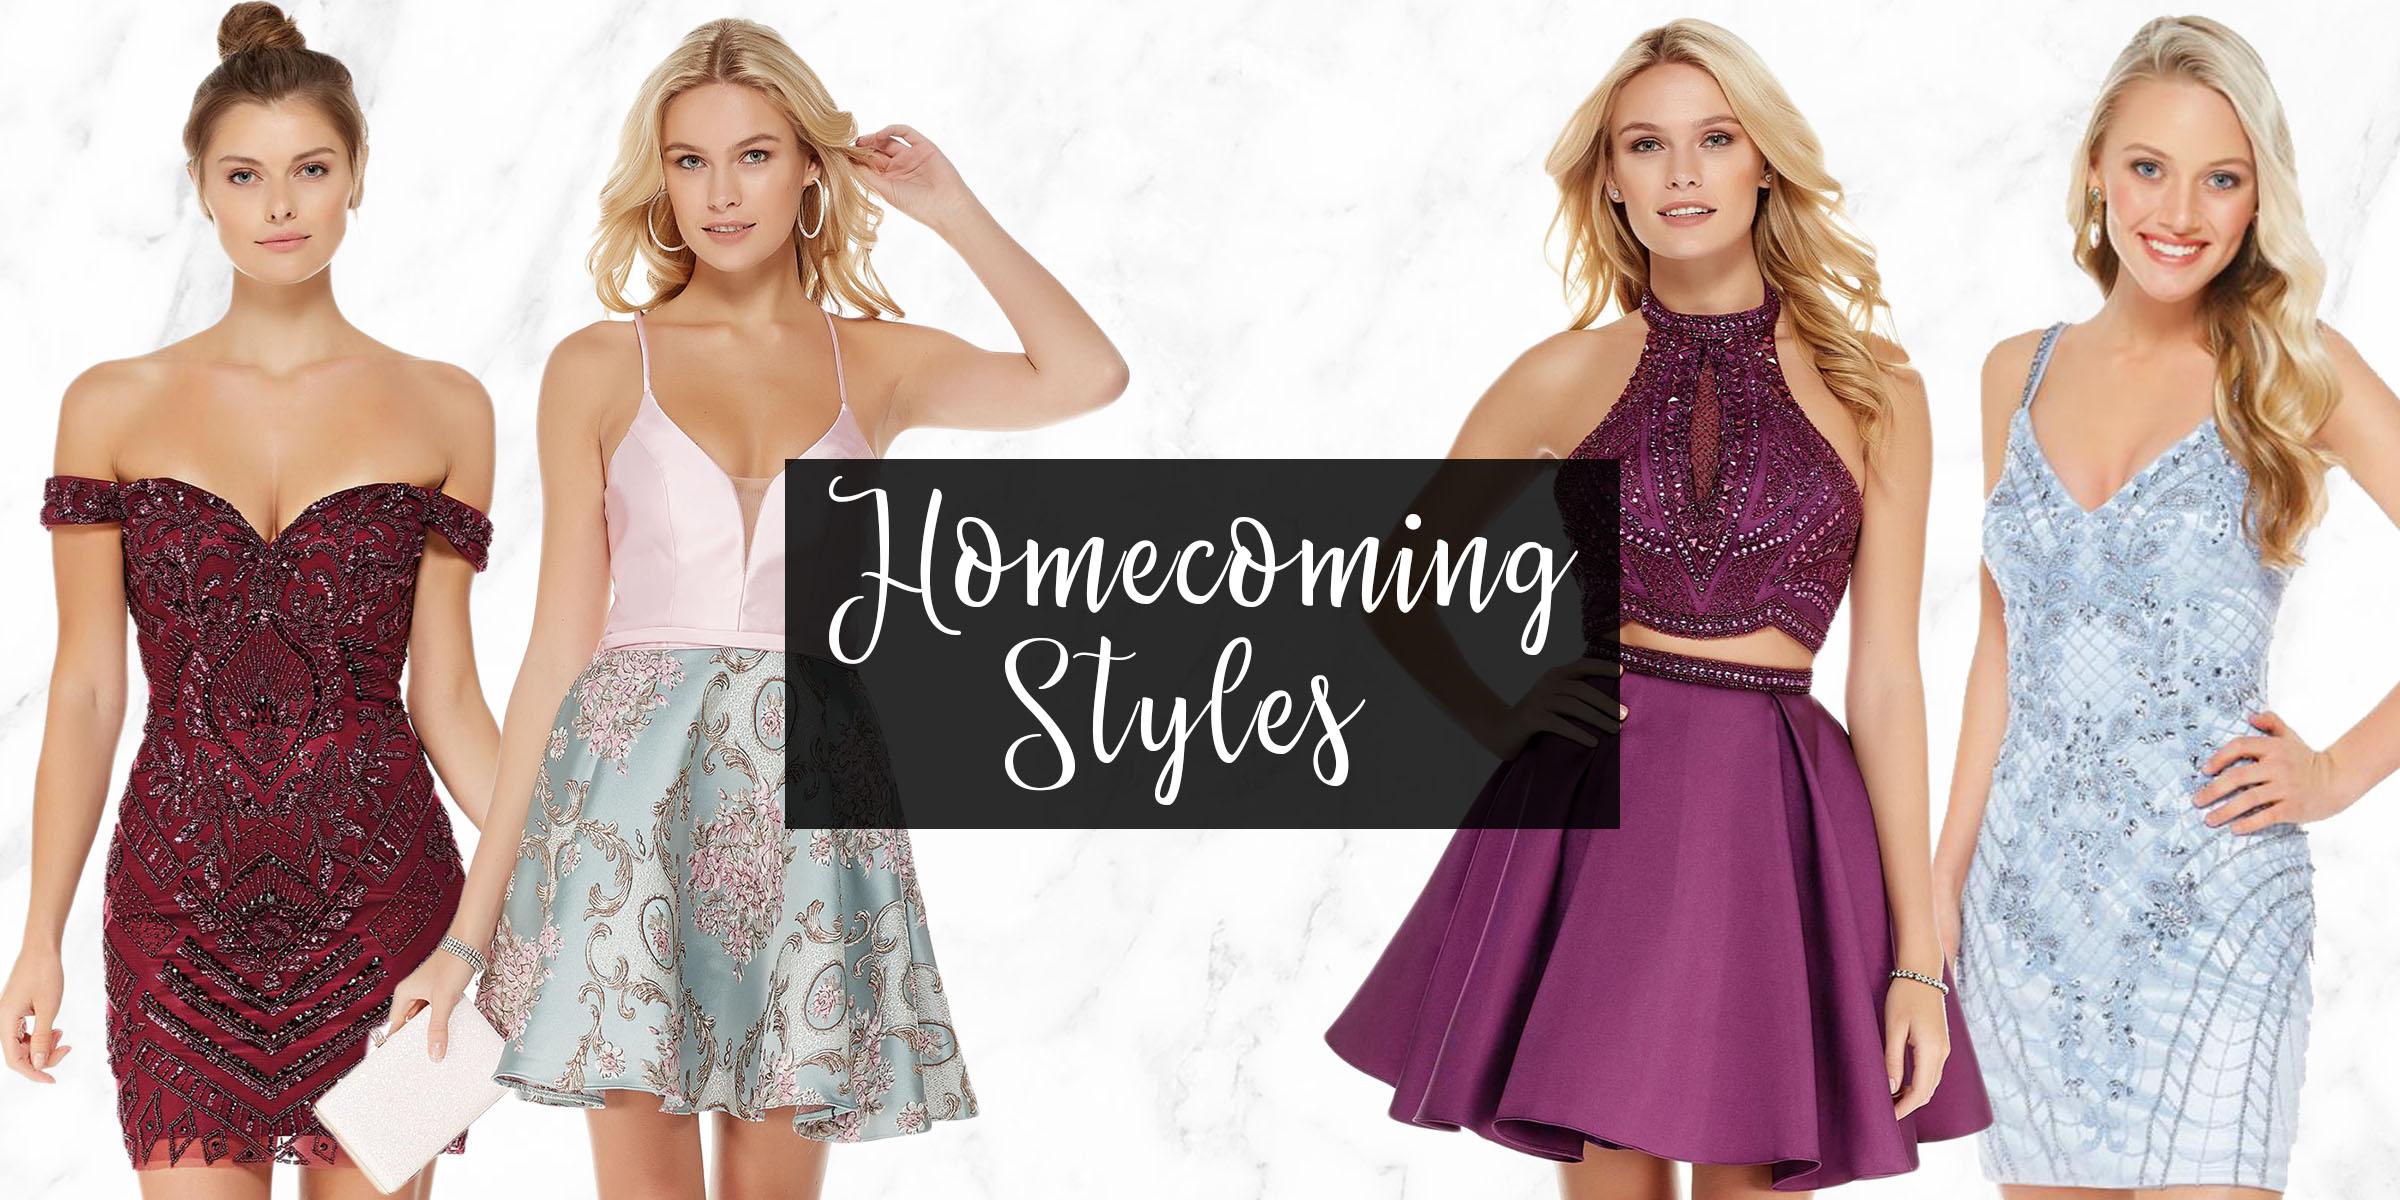 Homecoming dress 2018